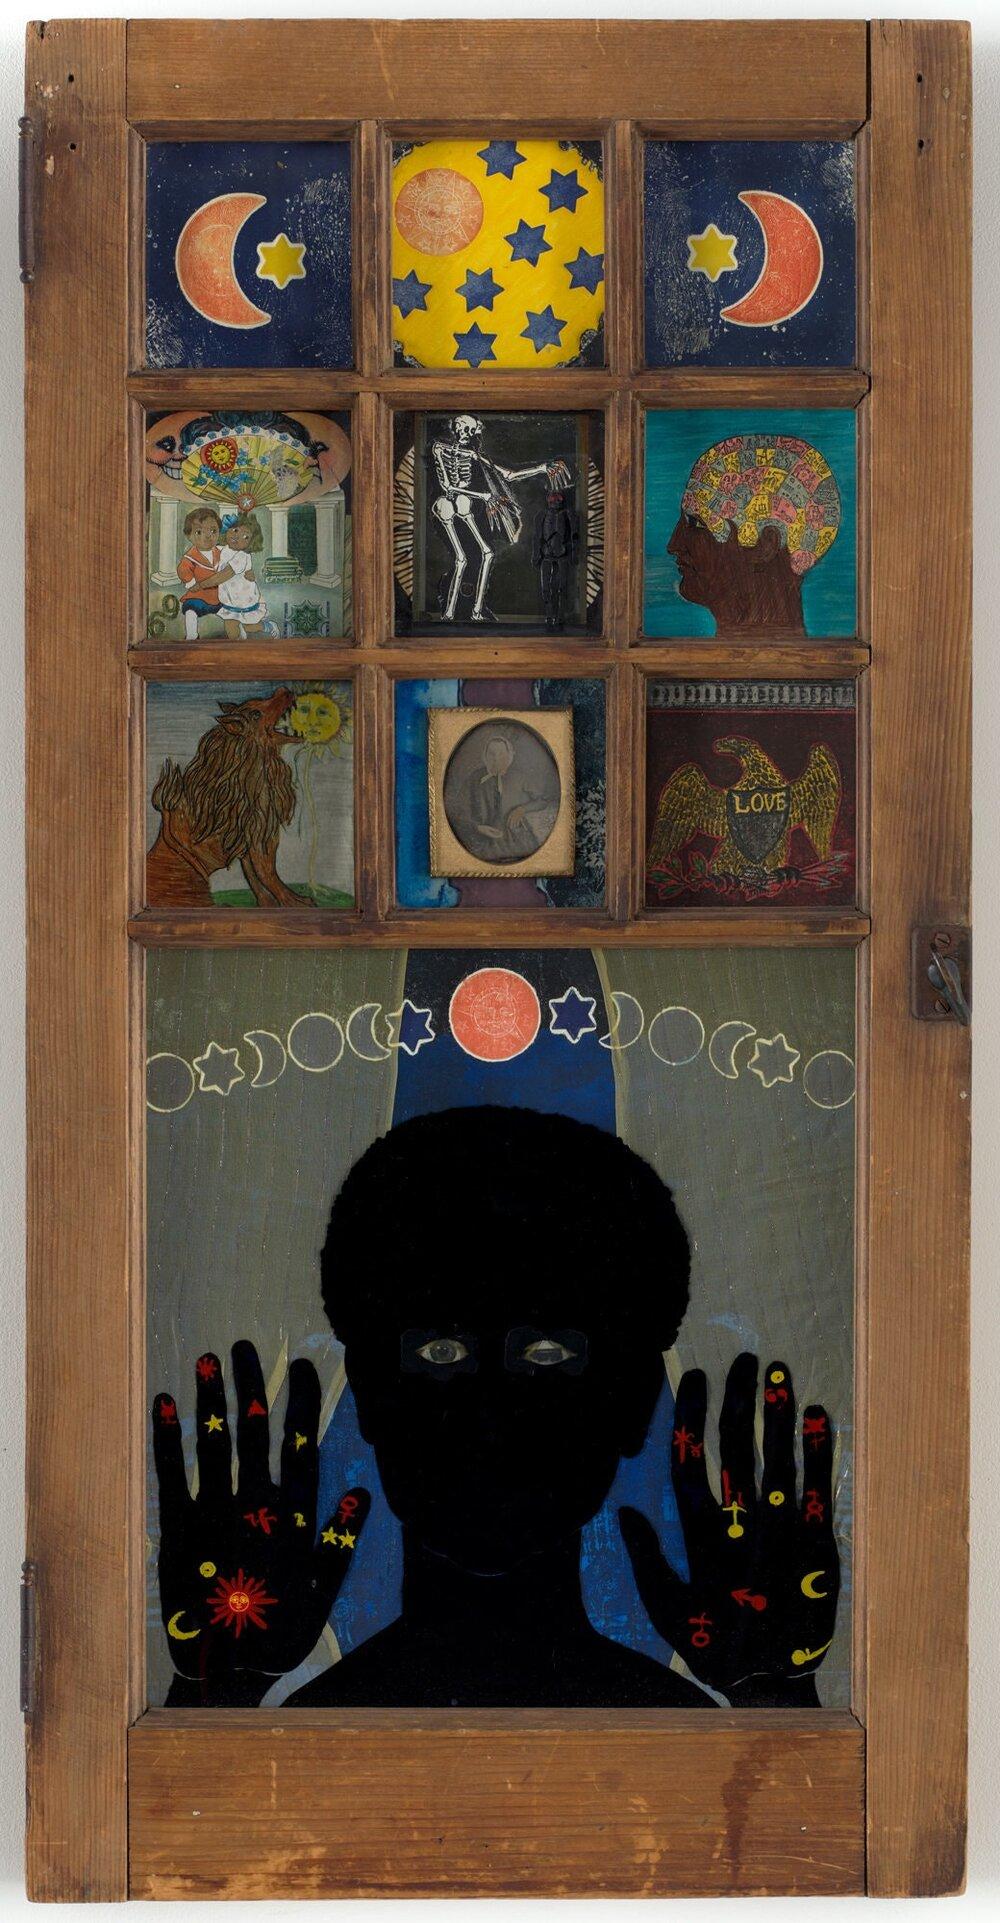 «Окно черной девочки», Бетти Саар, 1969, МоМА